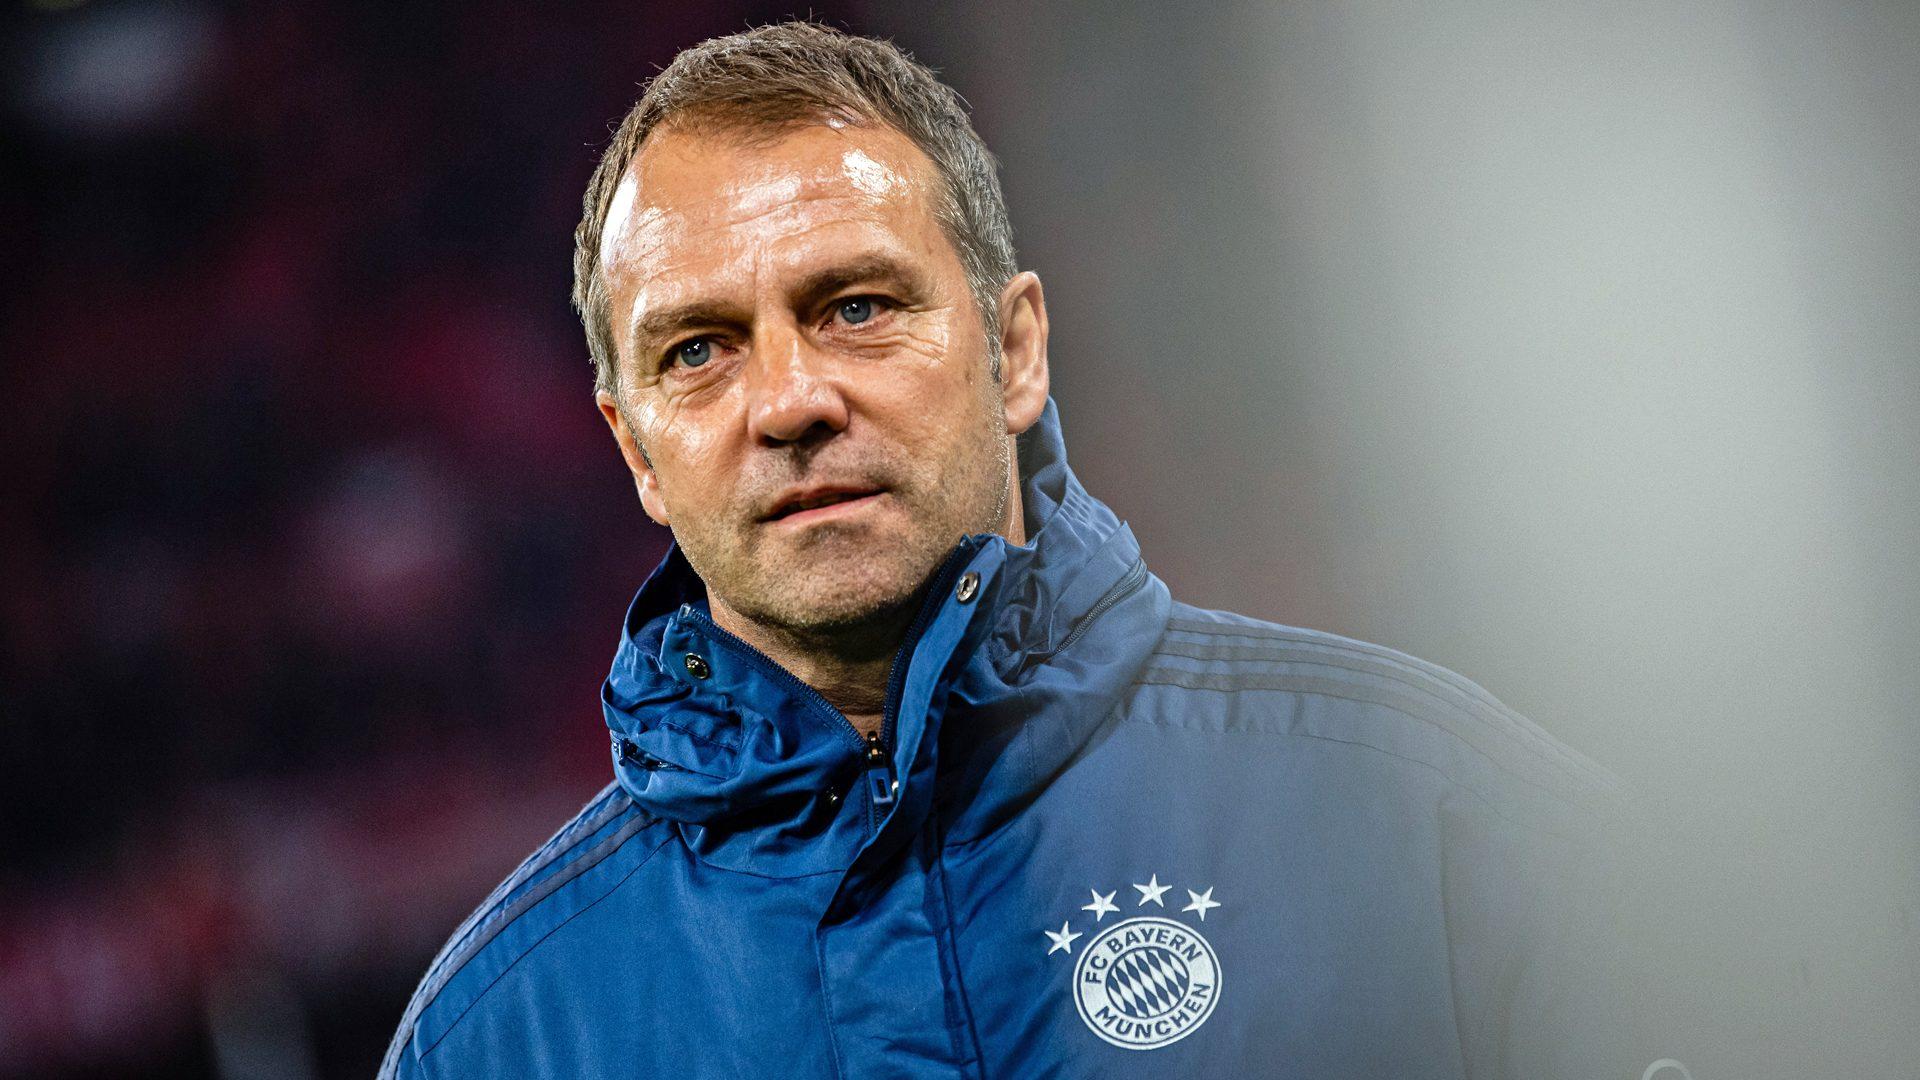 Bundesliga | Hansi Flick: 10 things on Bayern Munich's record-breaking,  treble-winning coach